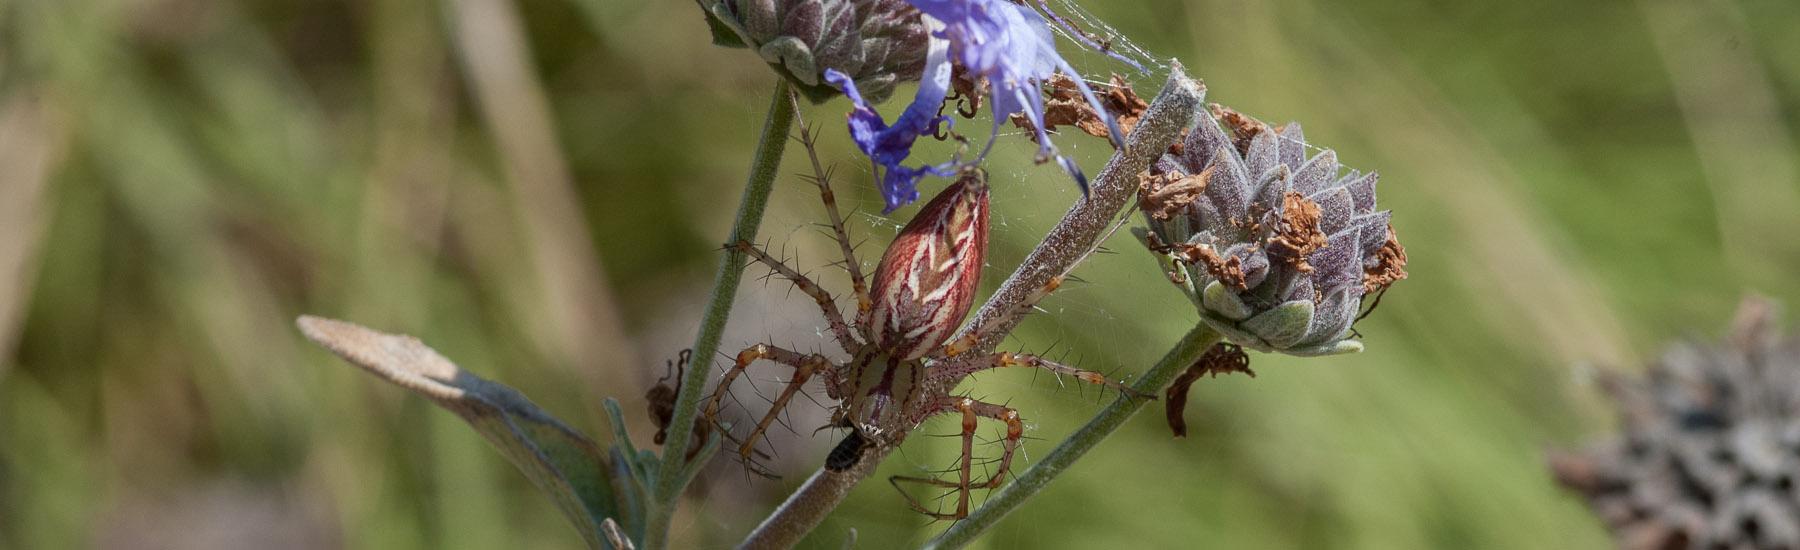 Salvia clevelandii hybrid; Lynx spider